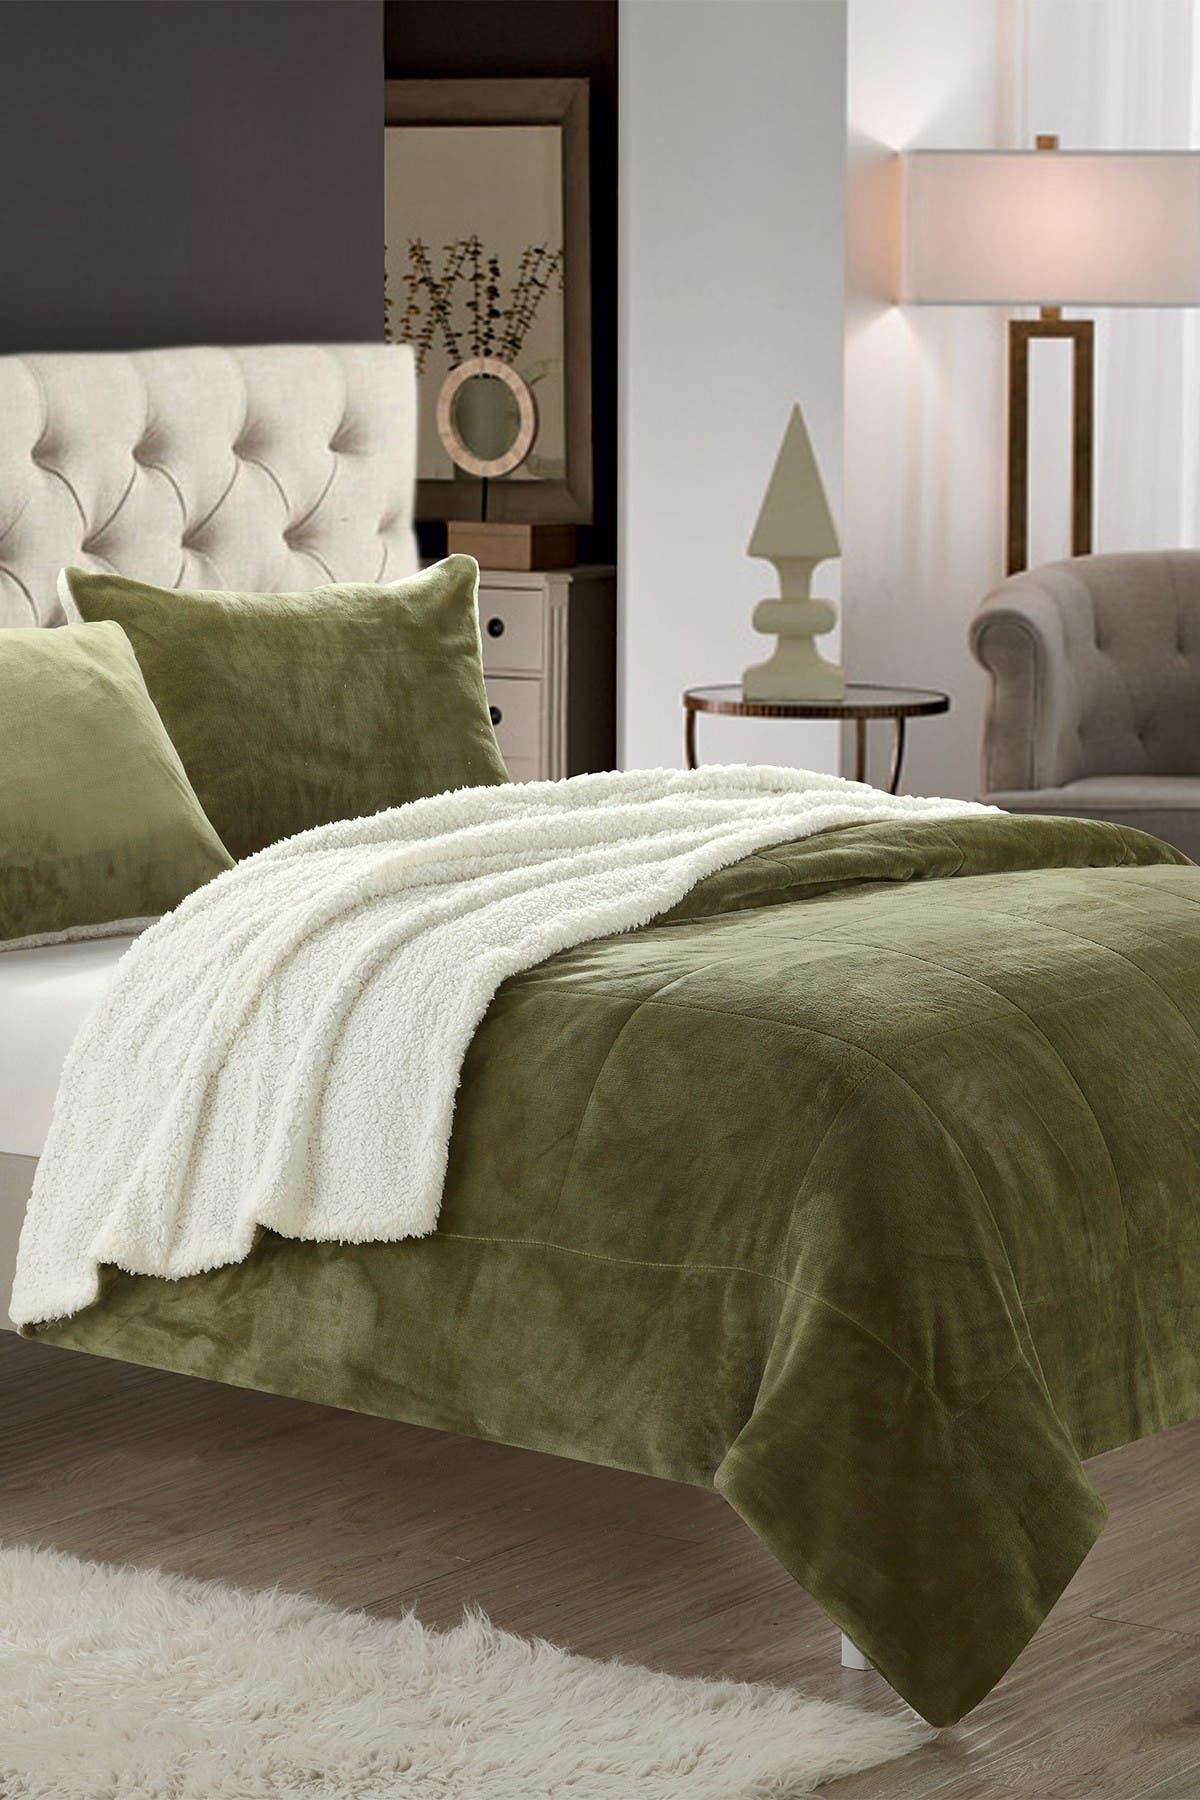 Image of Chic Home Bedding King Evelyn Blanket Set - Green